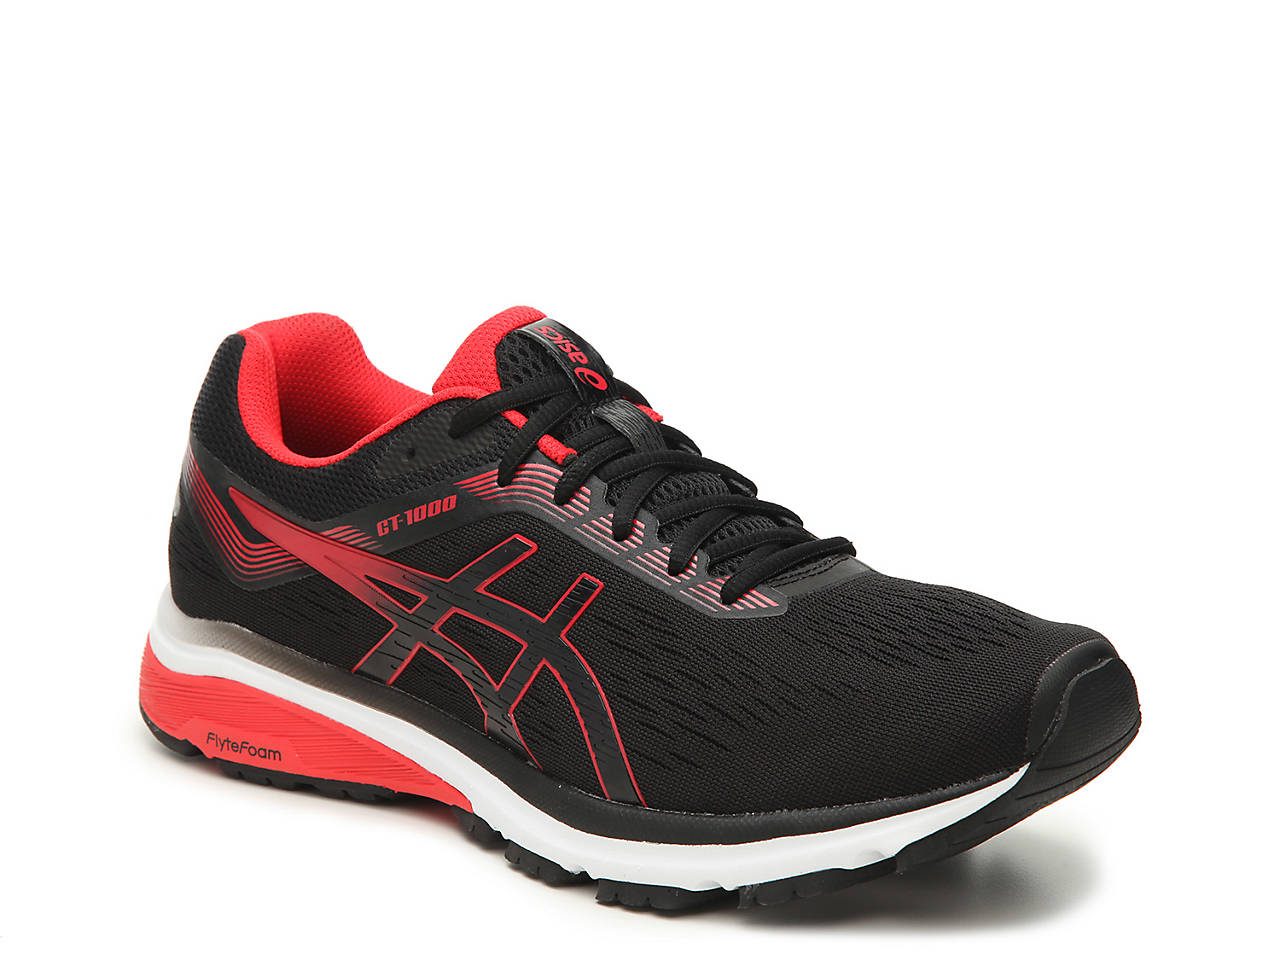 ASICS GT-1000 7 Performance Running Shoe - Men s Men s Shoes  a7dfb8d6c3